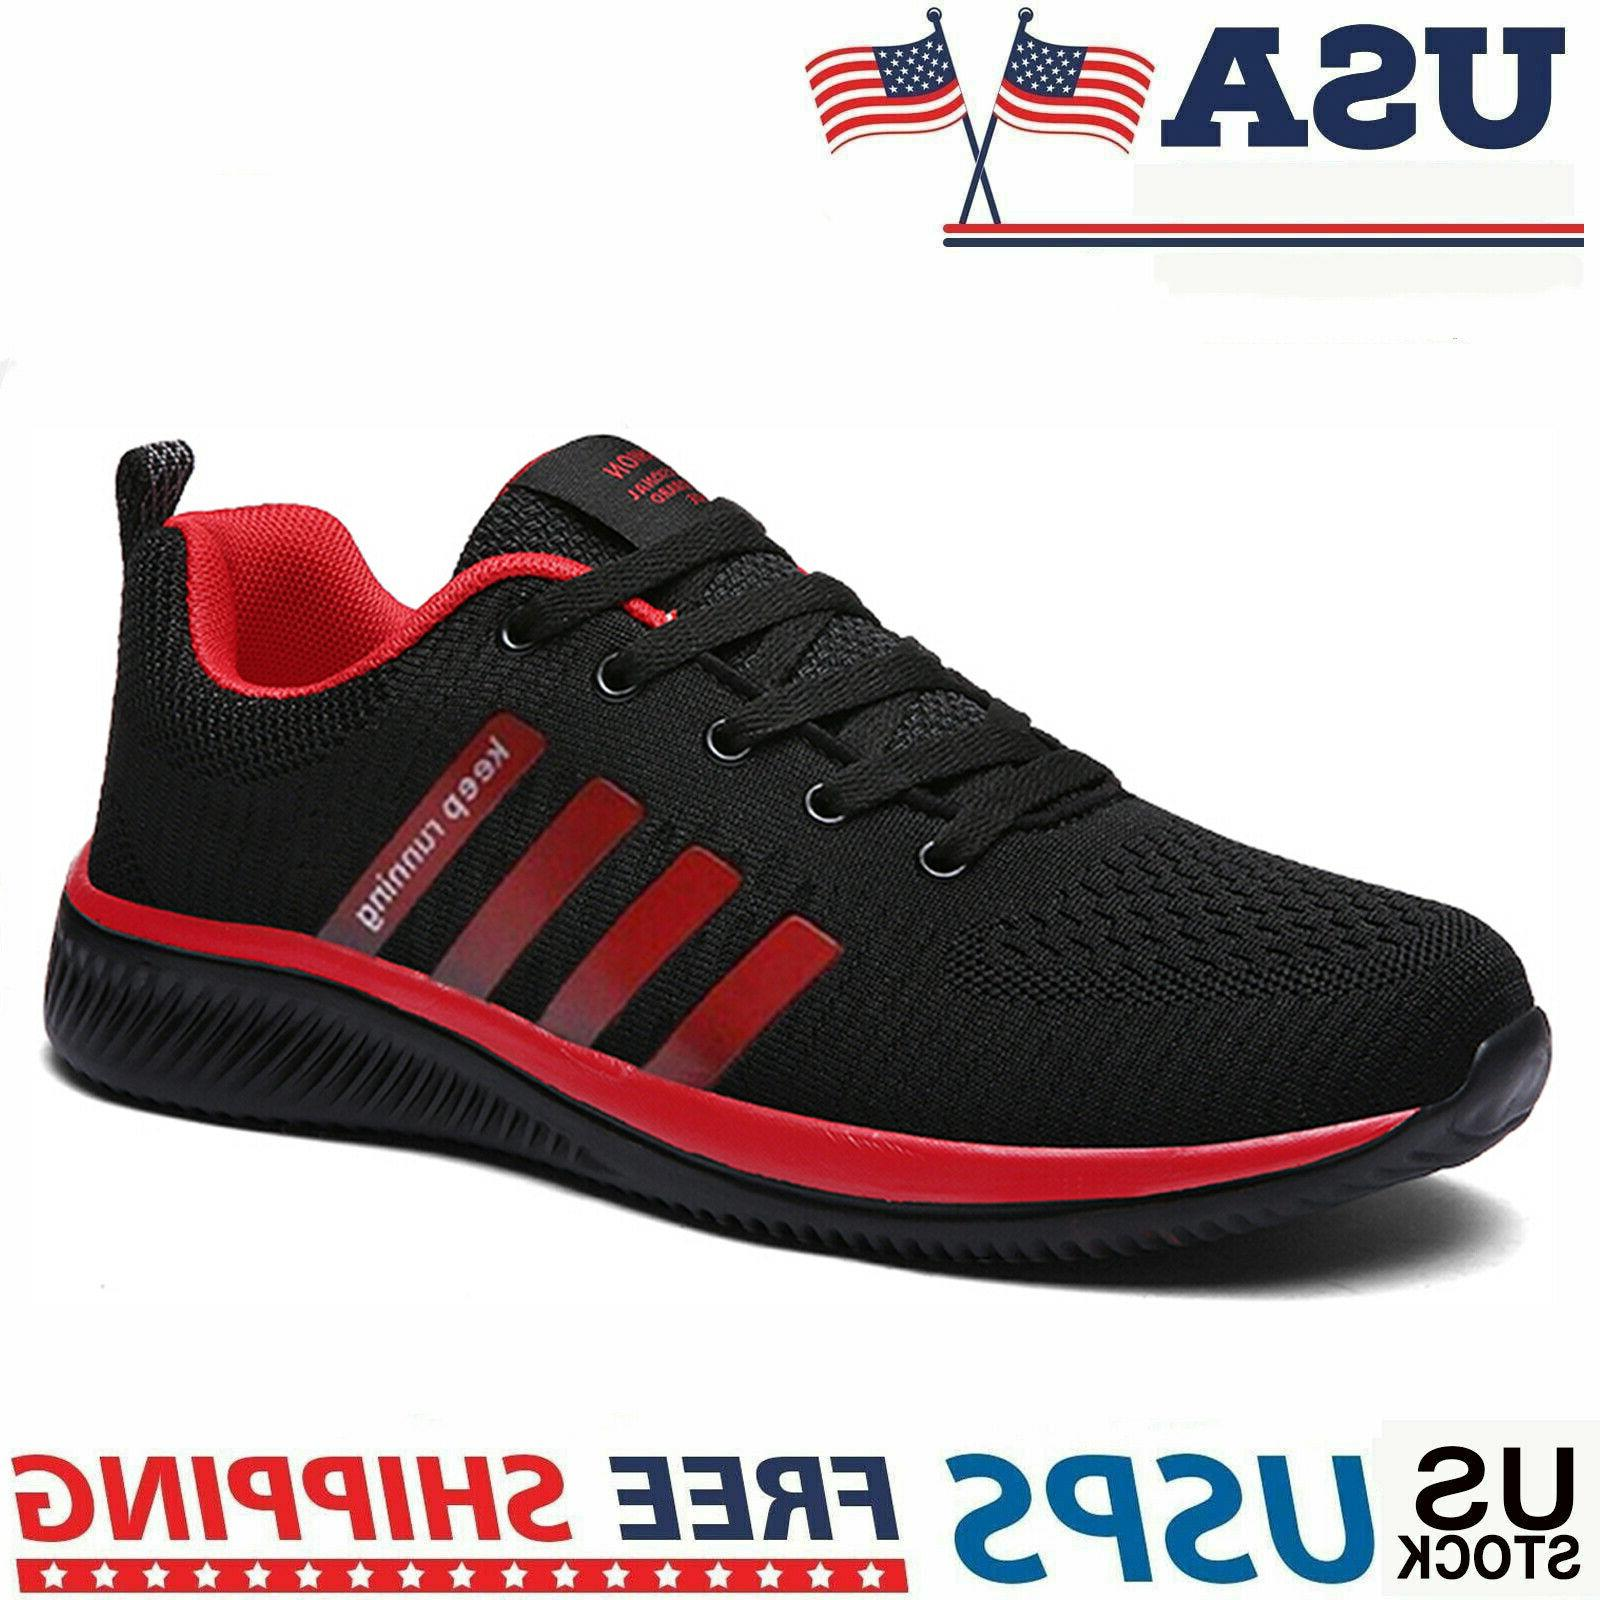 men s sneakers breathable running tennis athletic